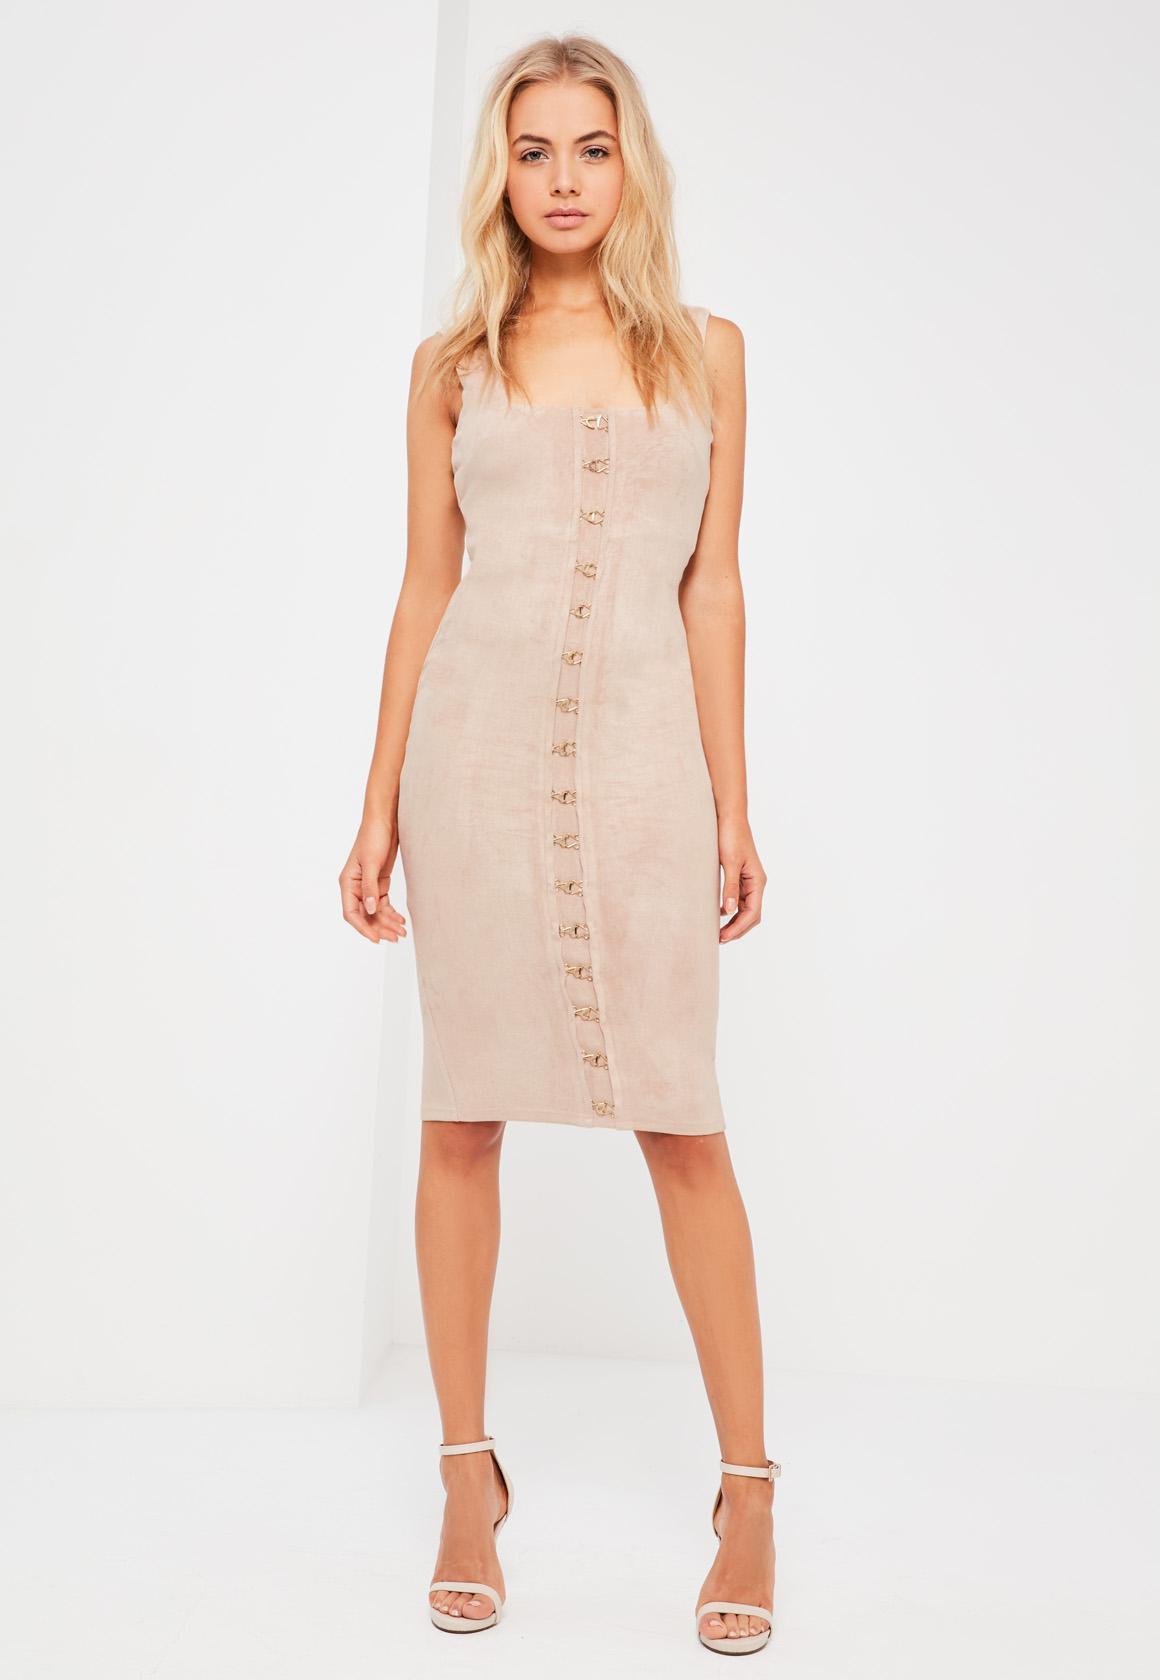 Nude Suede Eyelet Detail Midi Dress